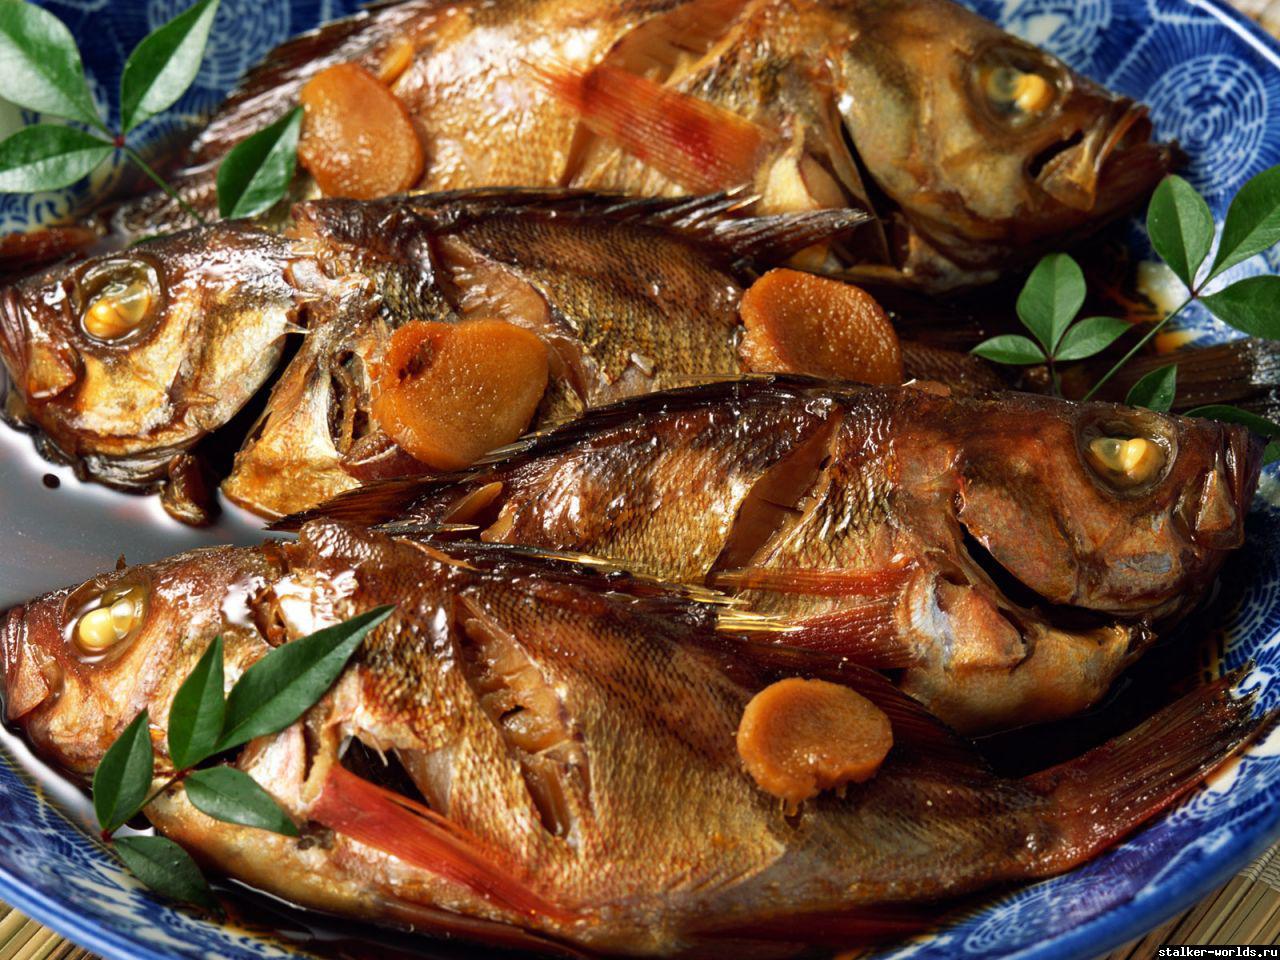 sw_1449865983__seafood_3012.jpg